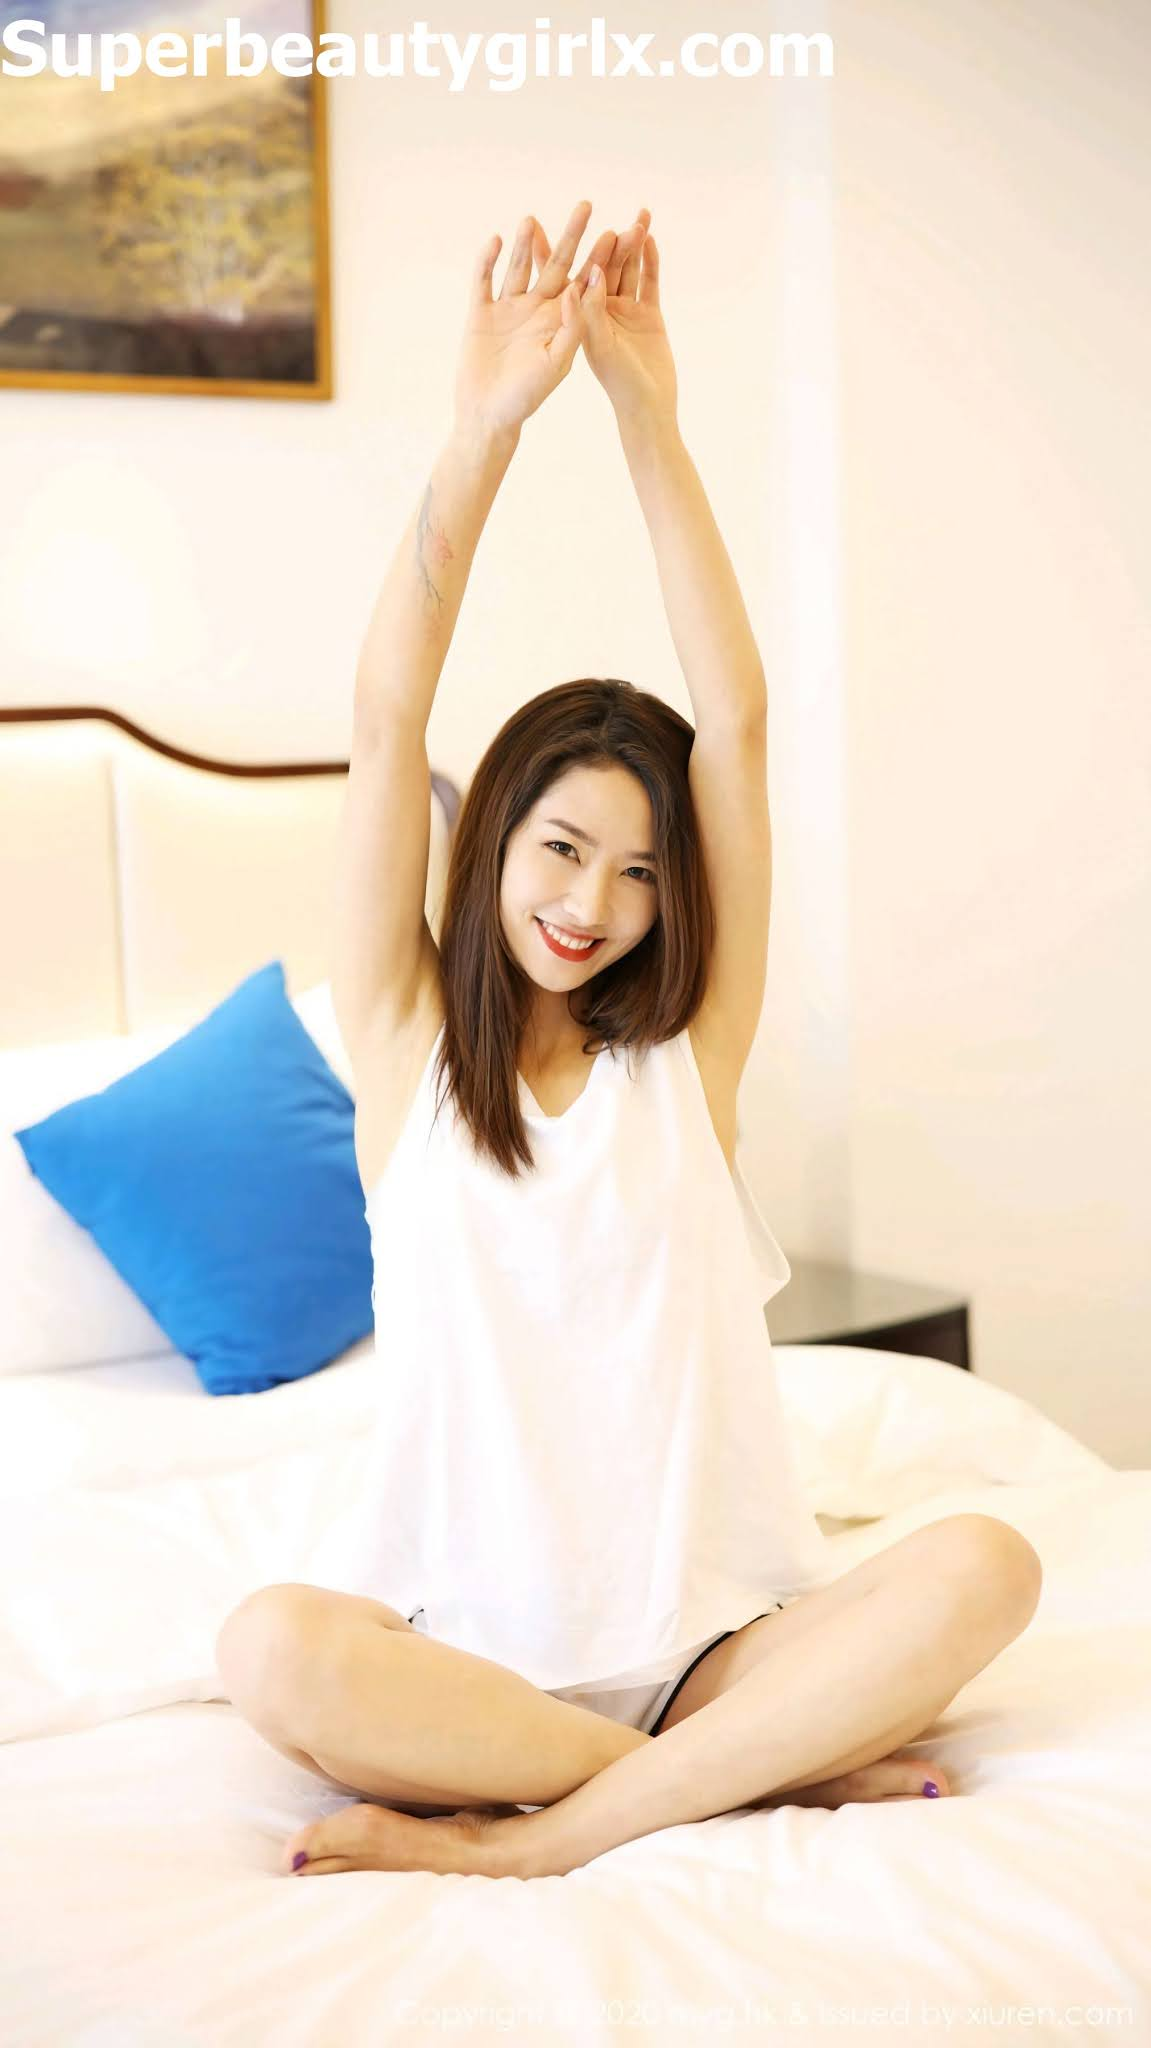 MyGirl-Vol.450-Fang-Zi-Xuan-Superbeautygirlx.com